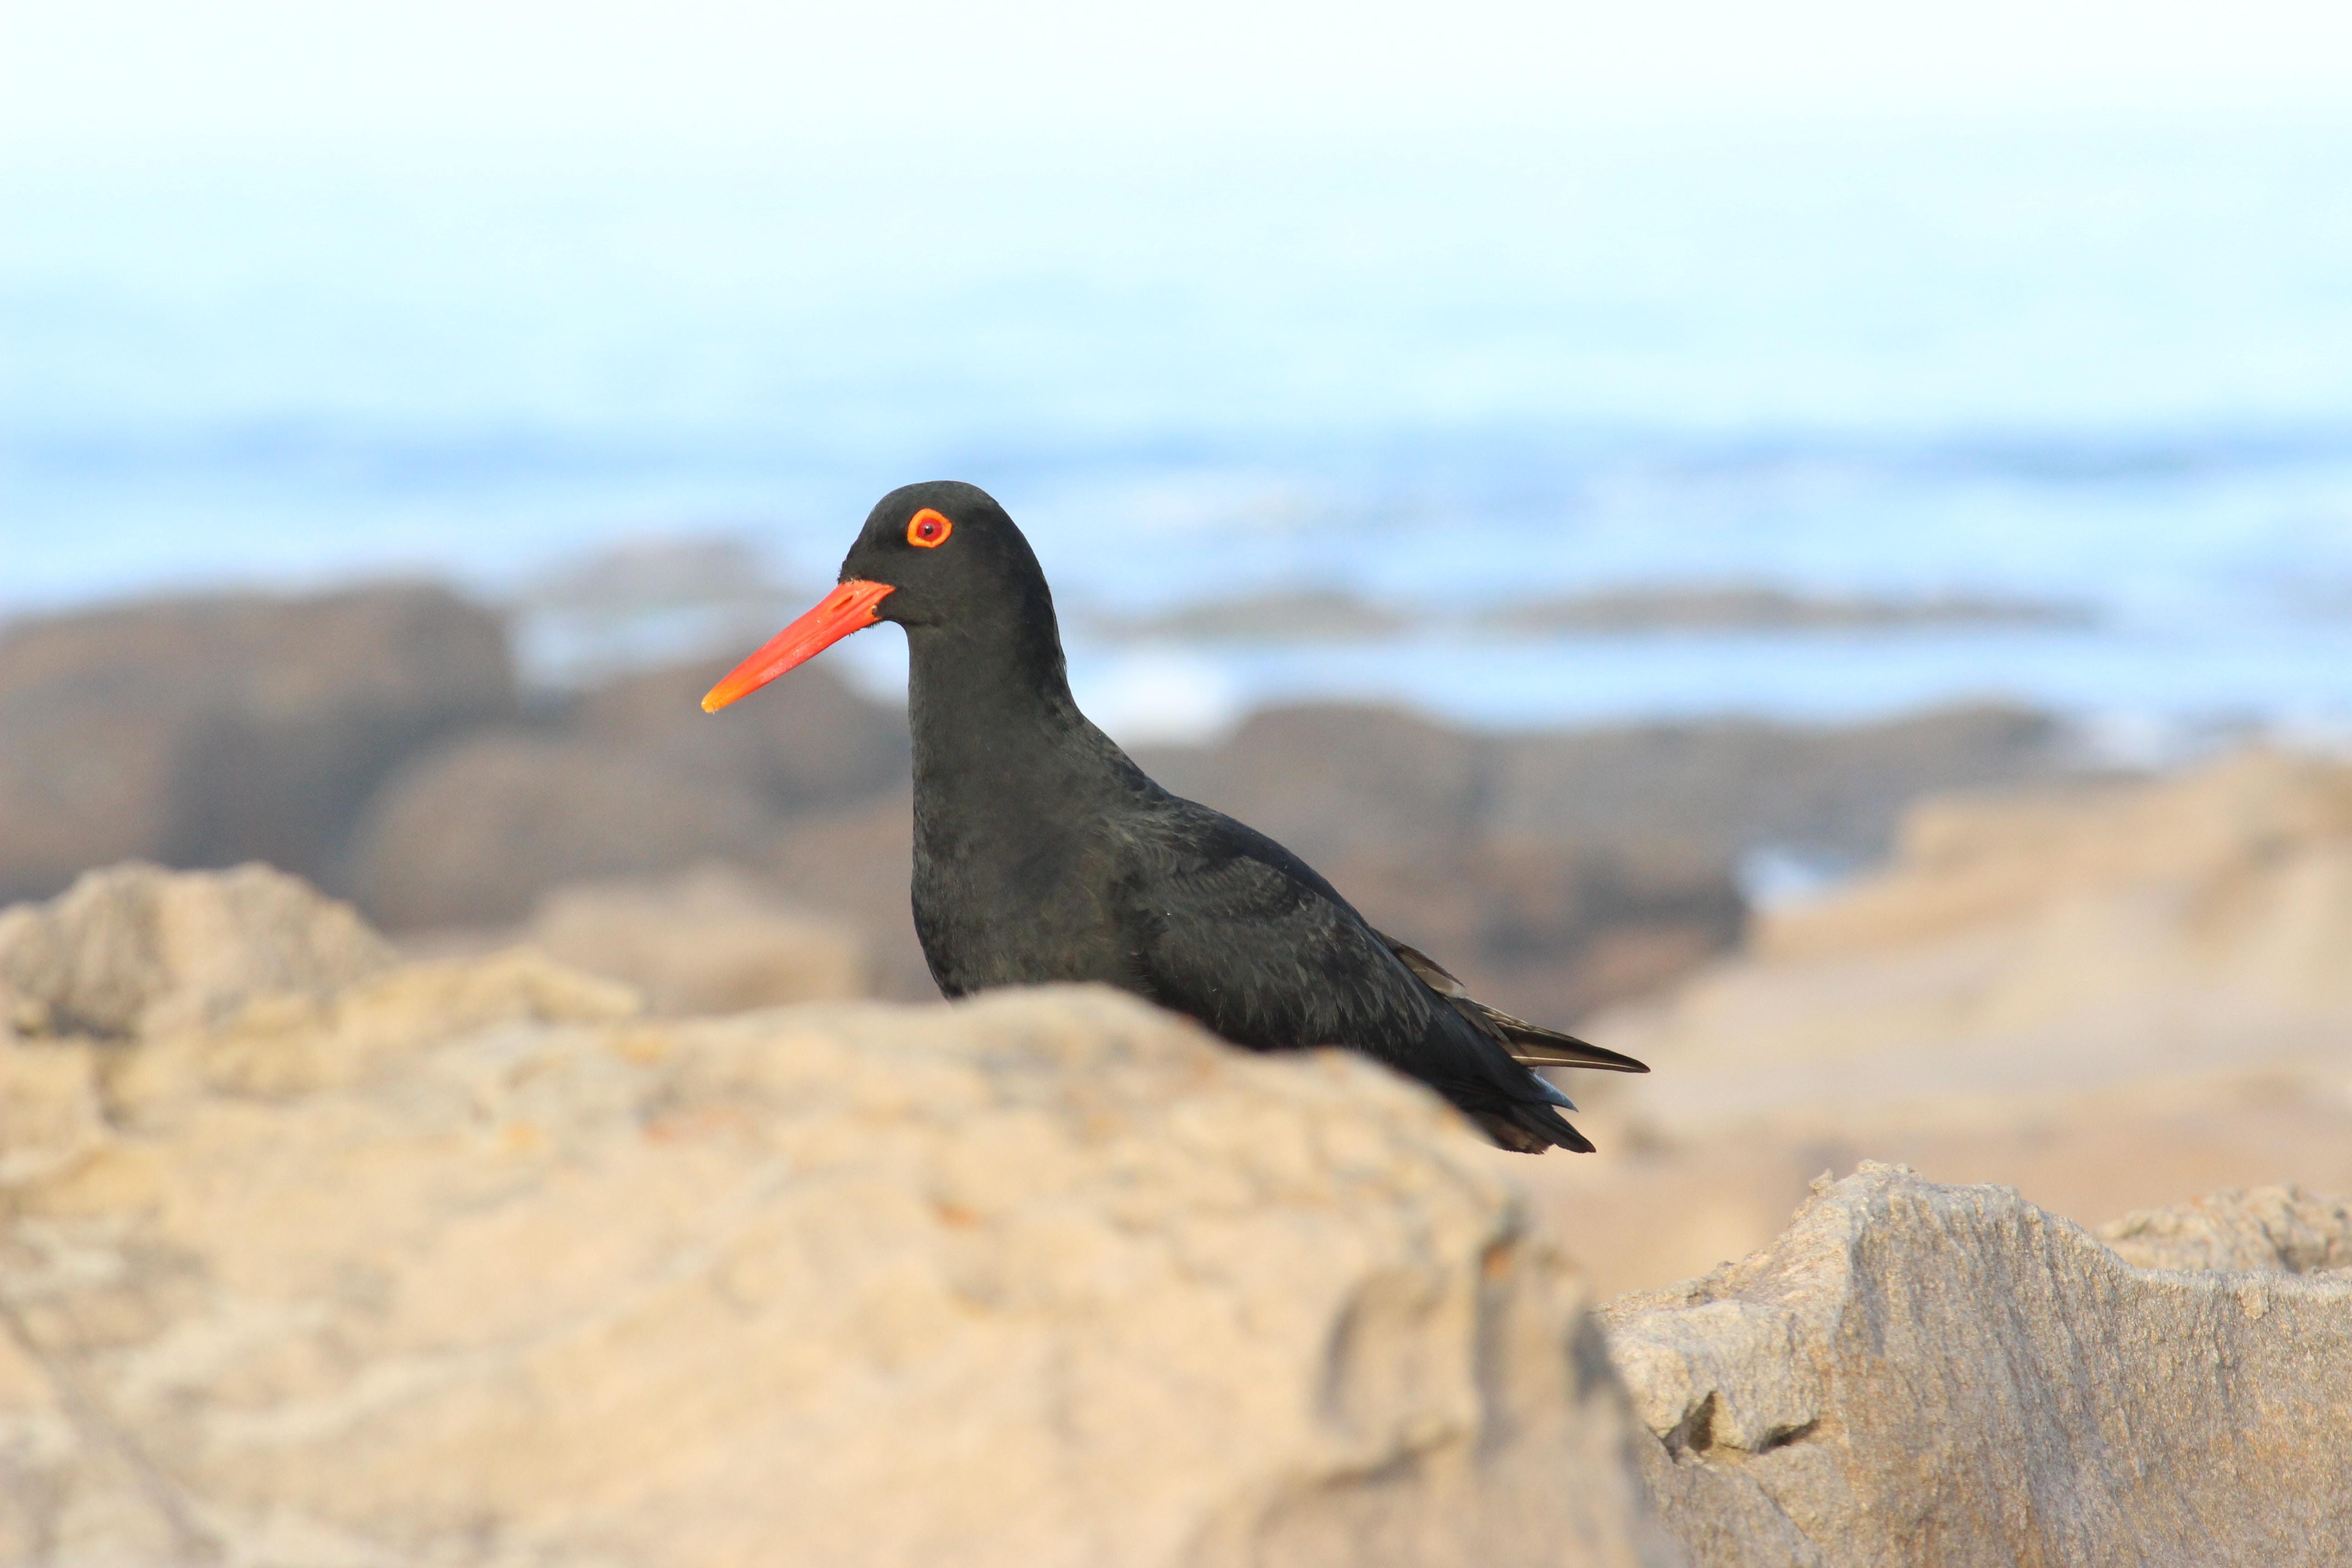 selective focus photography of black and orange bird